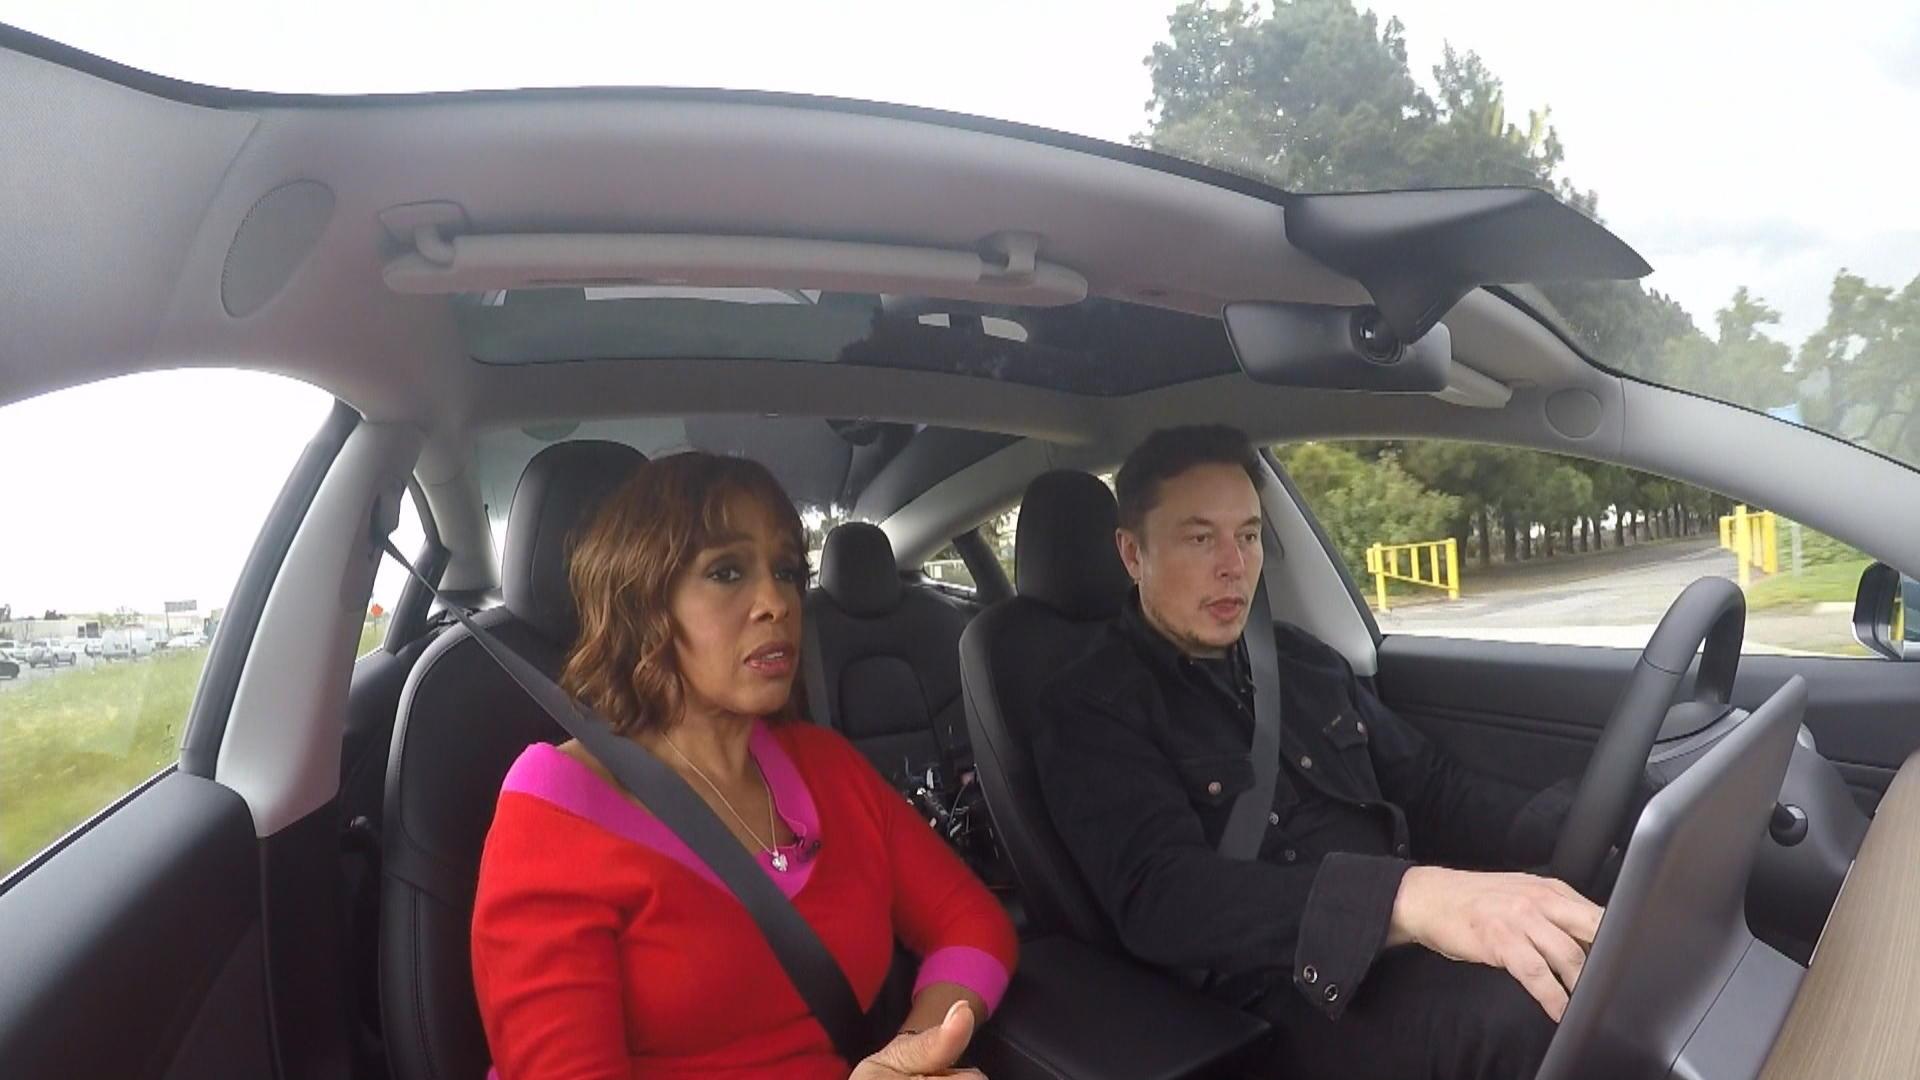 Tesla CEO Elon Musk addresses autopilot system safety concerns: